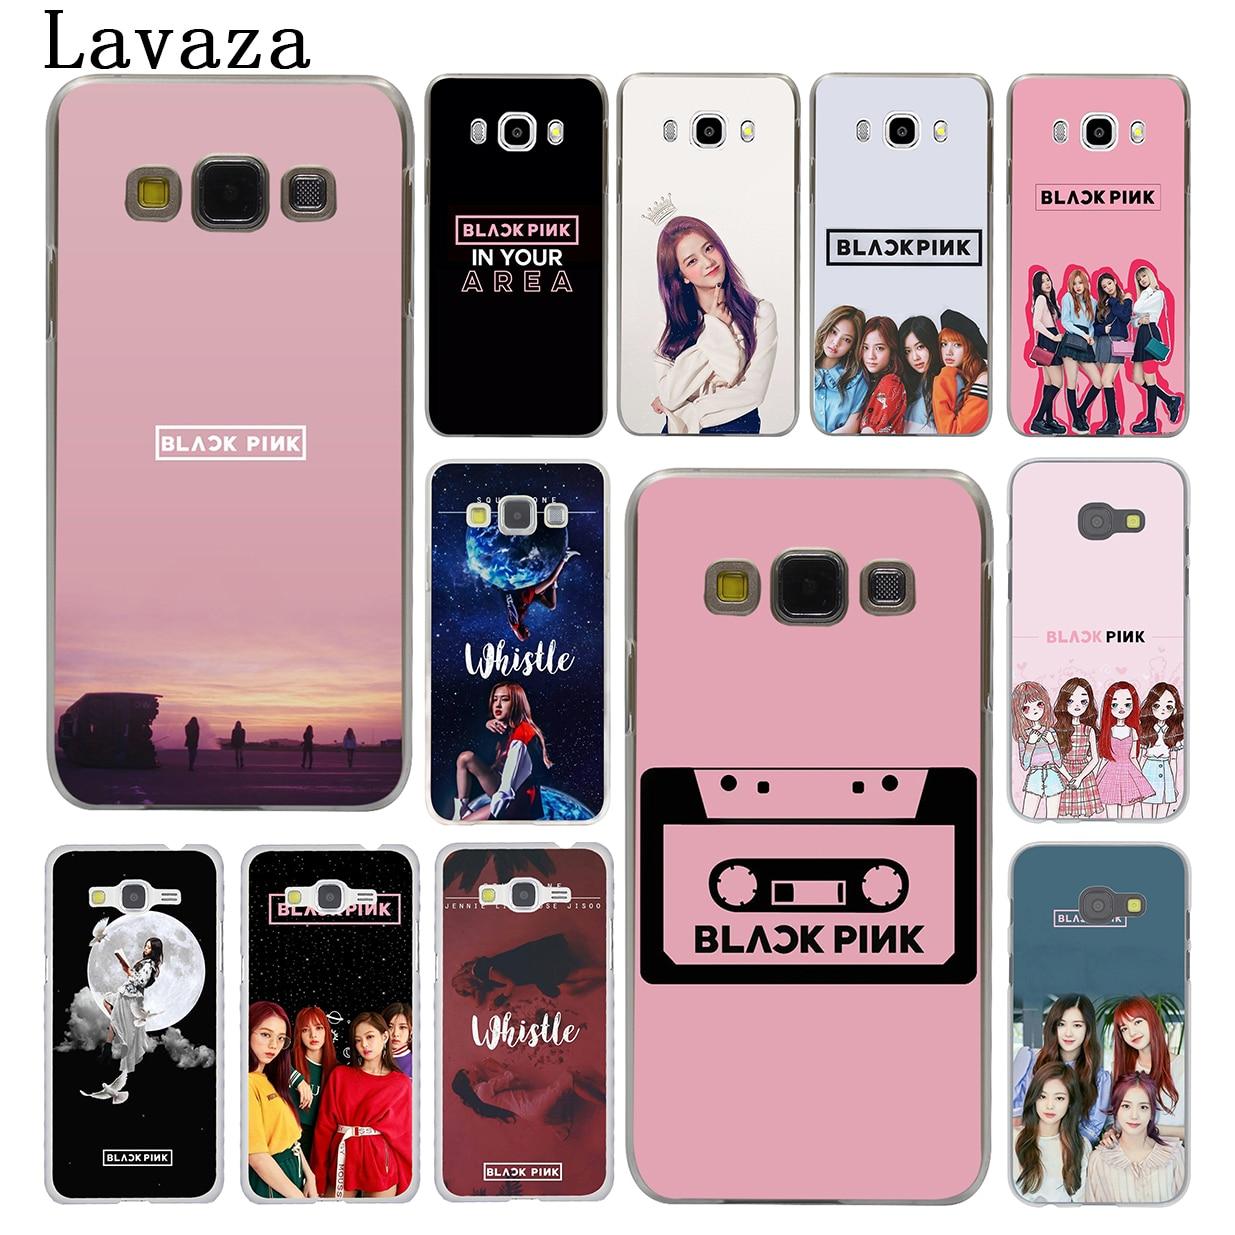 Lavaza BLACKPINK BLACK PINK JISOO Hard Phone Shell Case for Samsung Galaxy J7 J1 J2 J3 J5 2015 2016 2017 Prime Pro Ace 2018 Cove